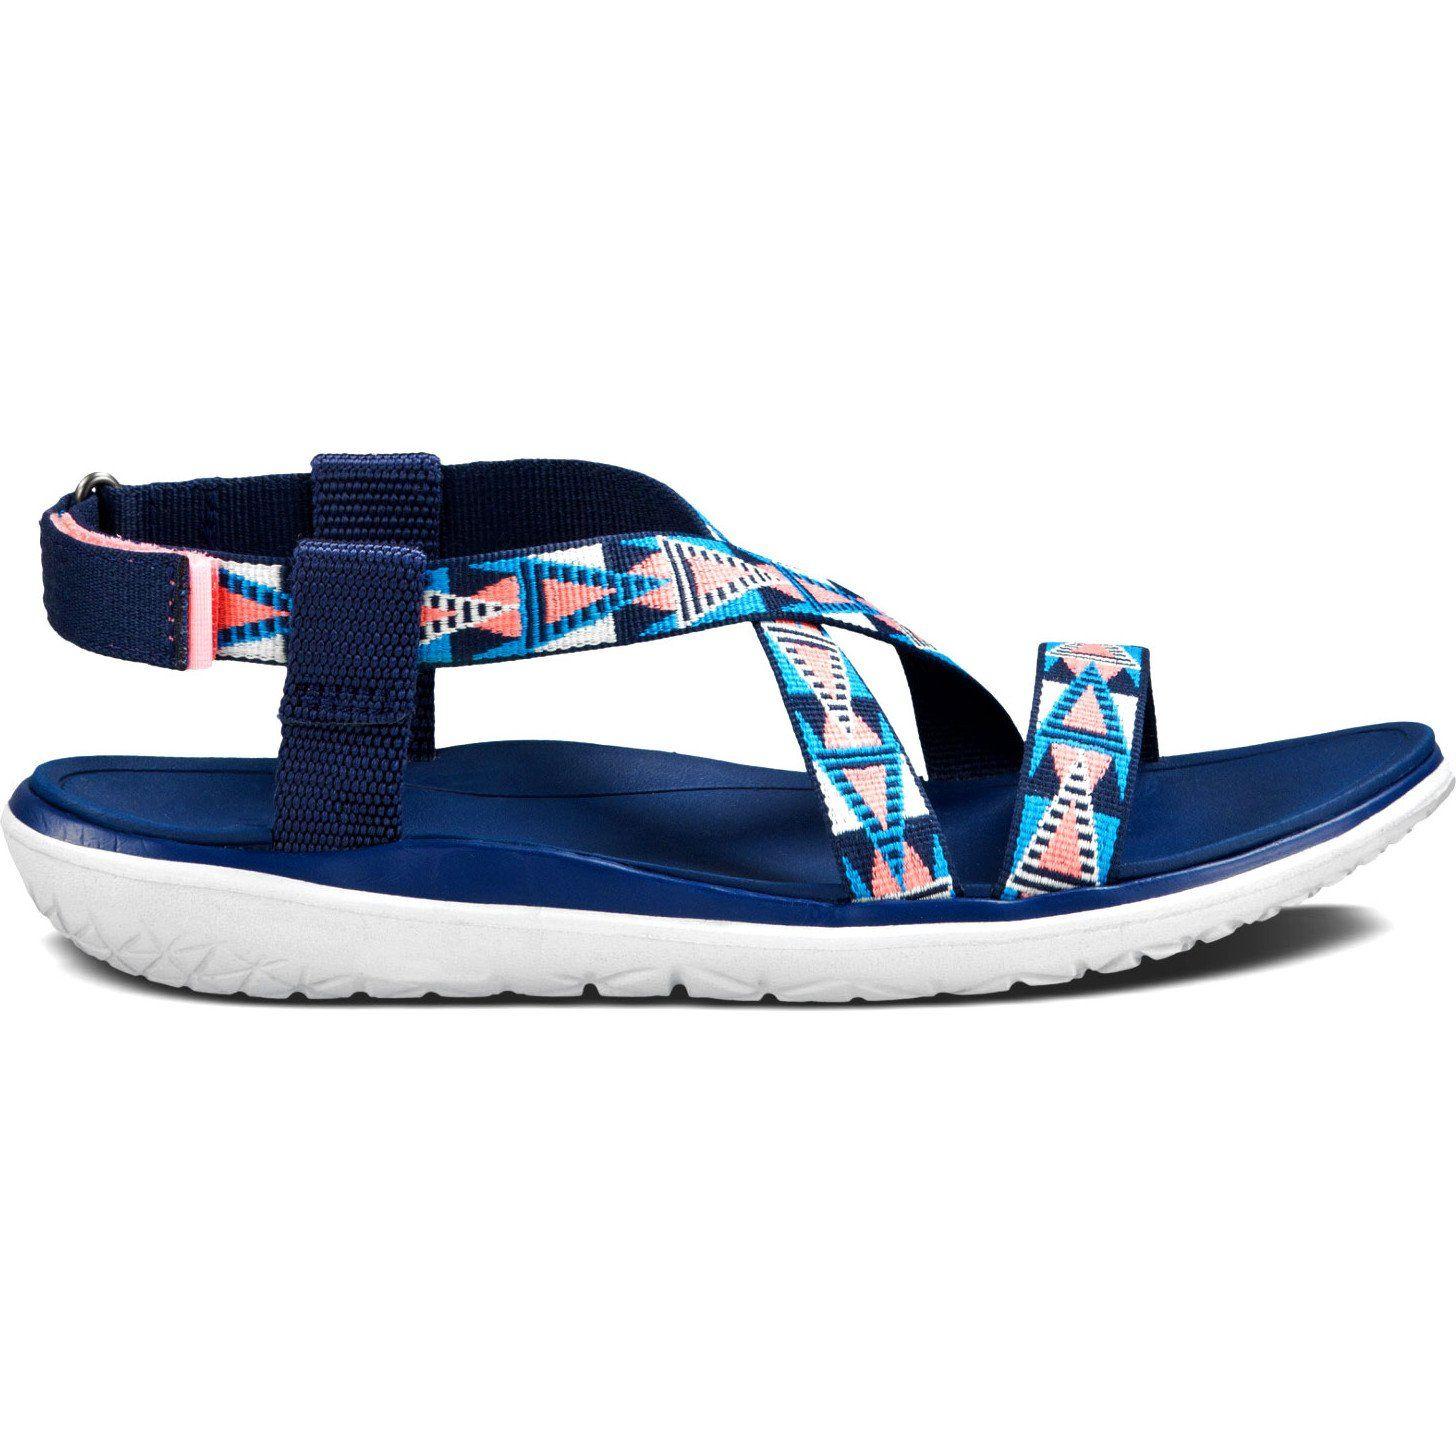 e09c4753c6e5 Teva Terra Float Livia Womens Sandals from Fitness Footwear